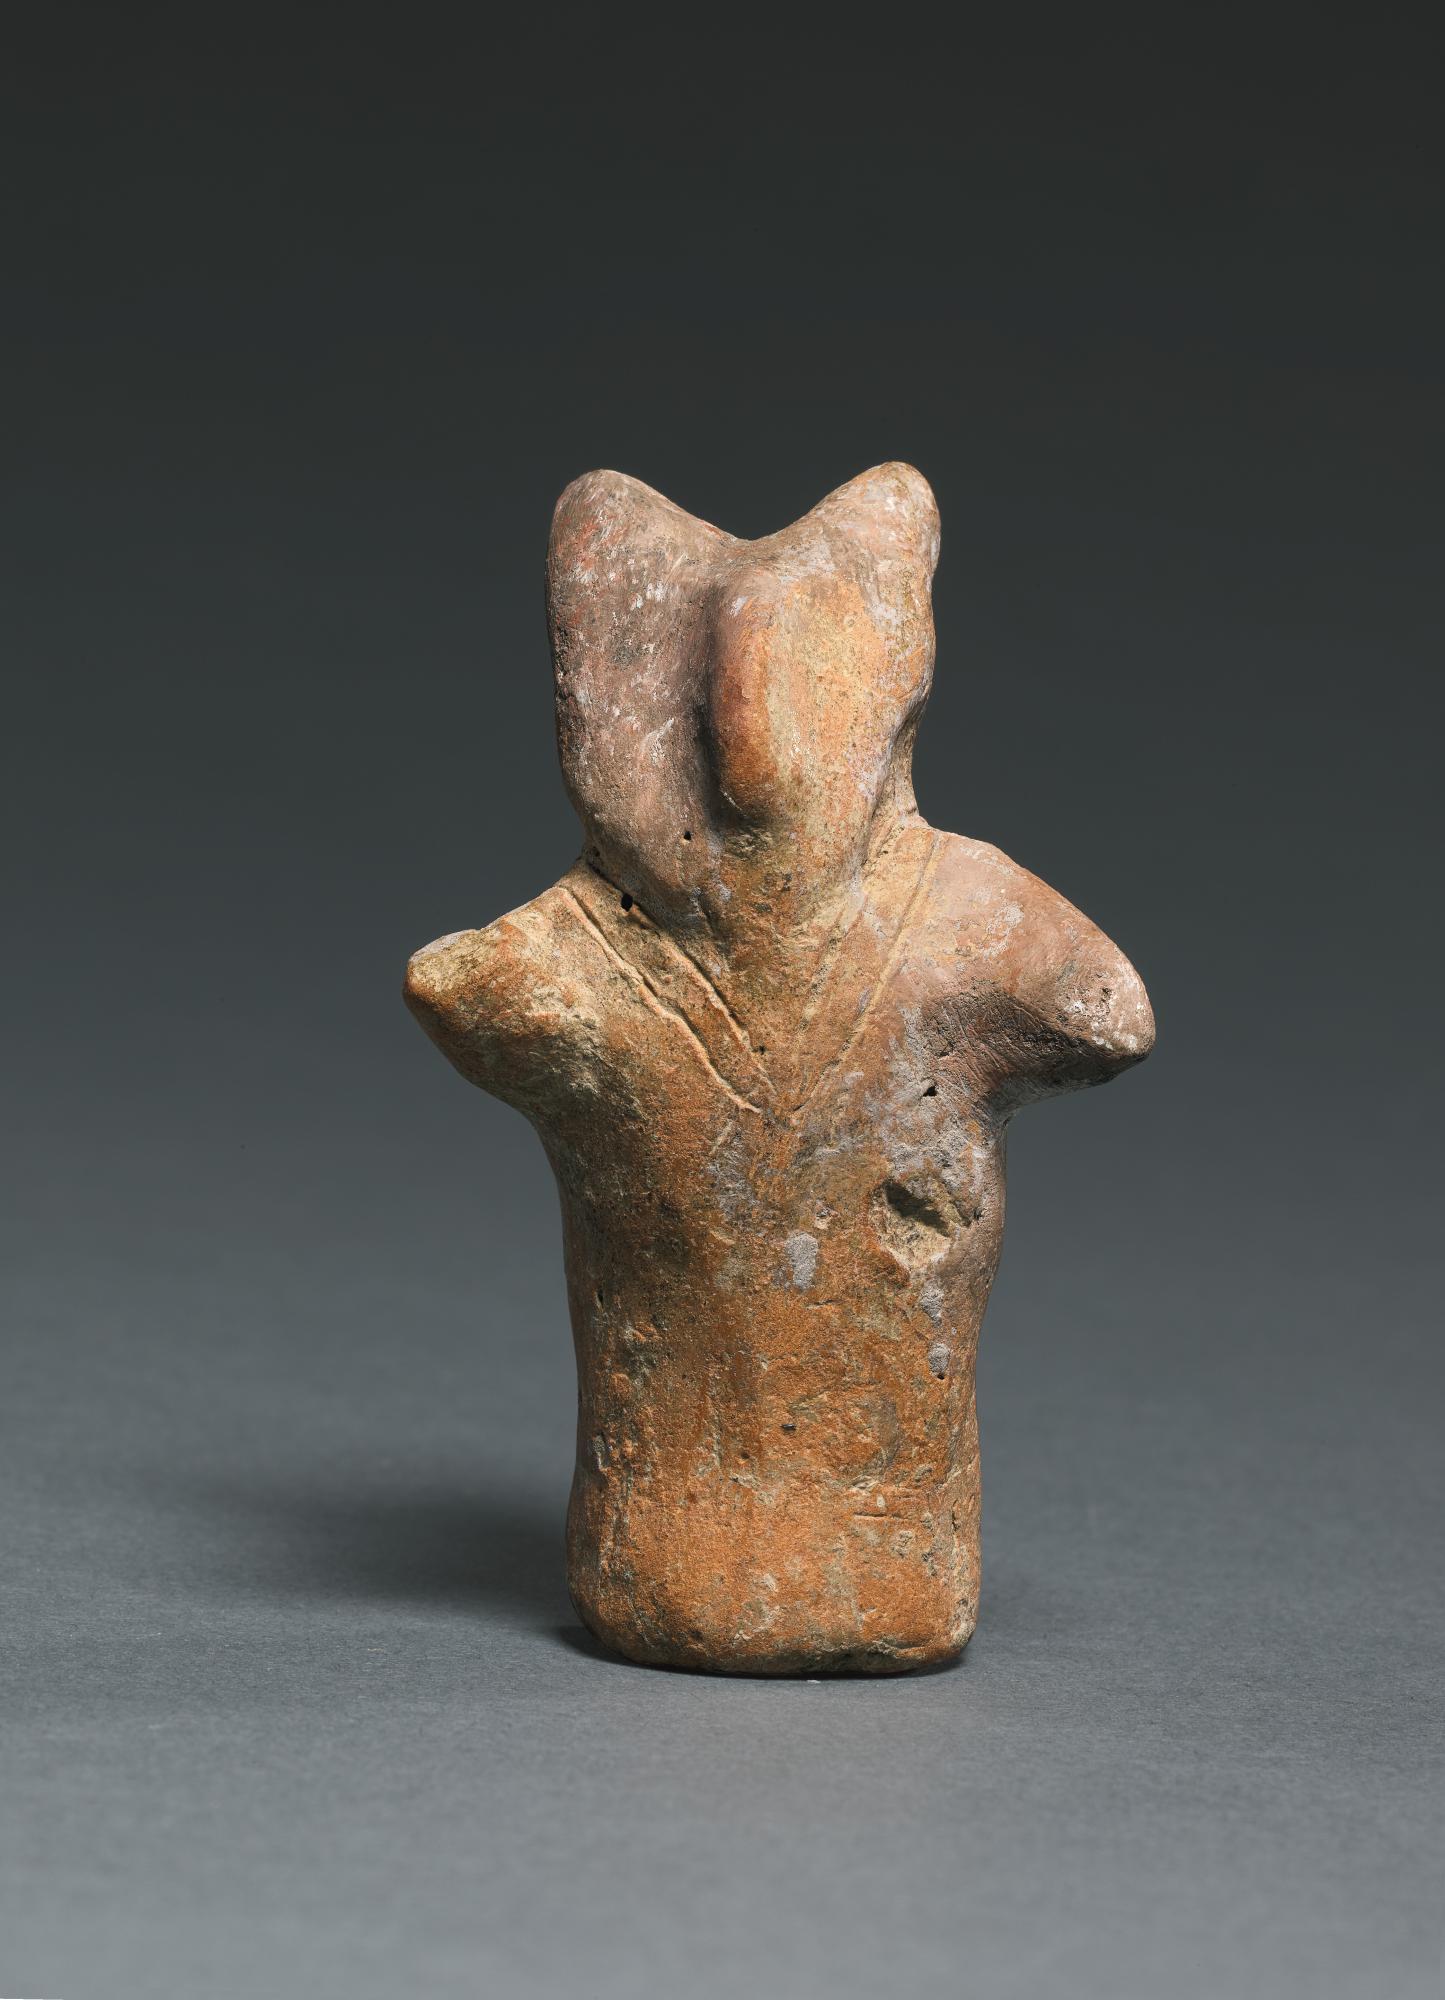 A TERRACOTTA ZOOMORPHIC FIGURE, STARČEVO CULTURE, EARLY NEOLITHIC PERIOD, 6200-5600 B.C.